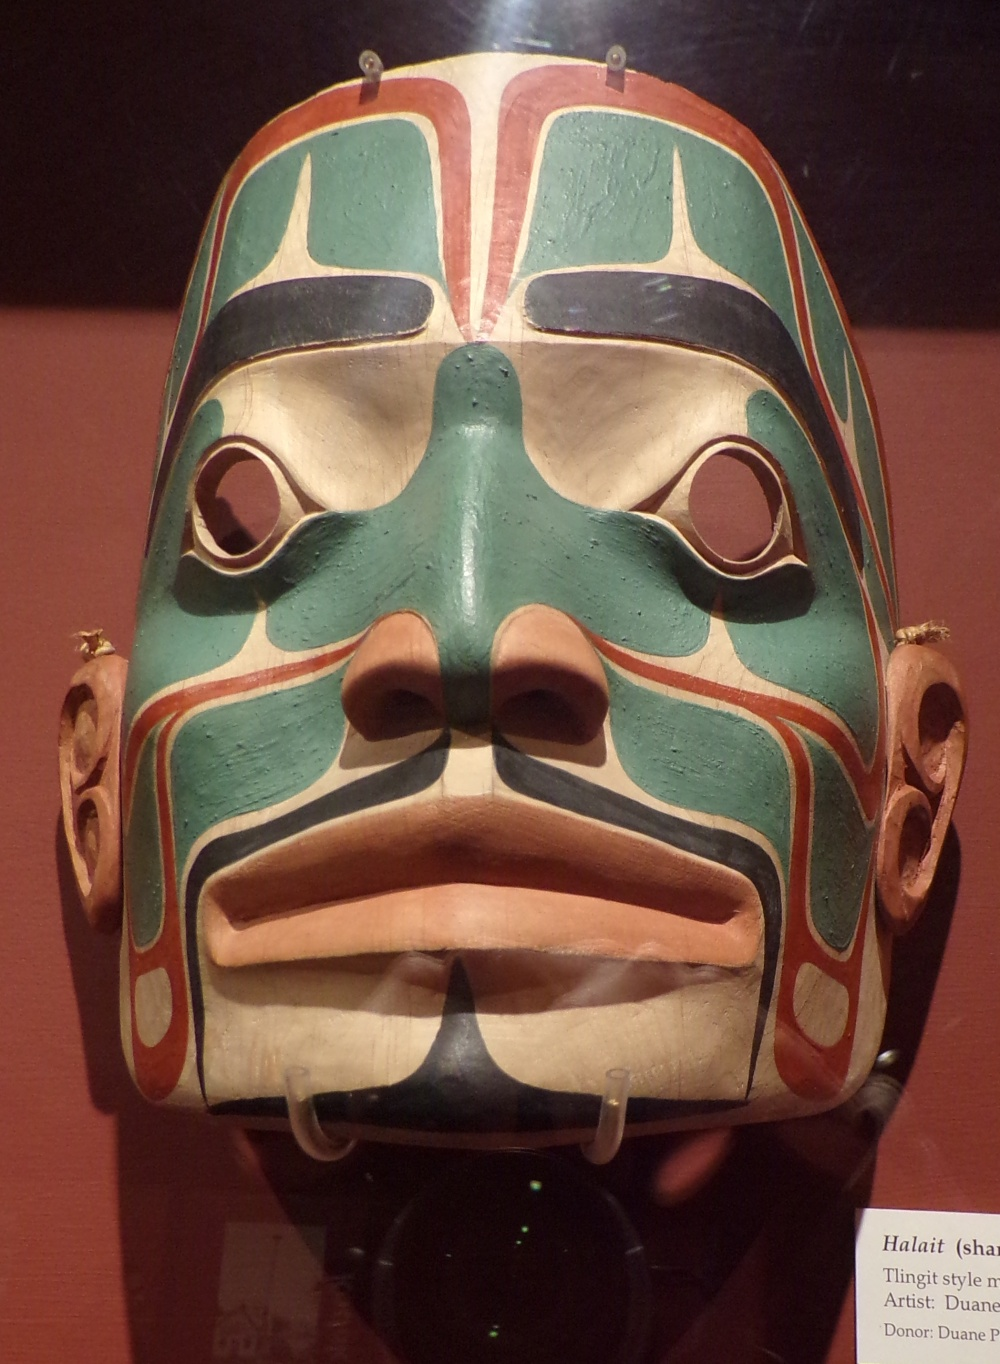 Halait (shaman) - Tlingit style mask, 1979; artist: Duane Pasco